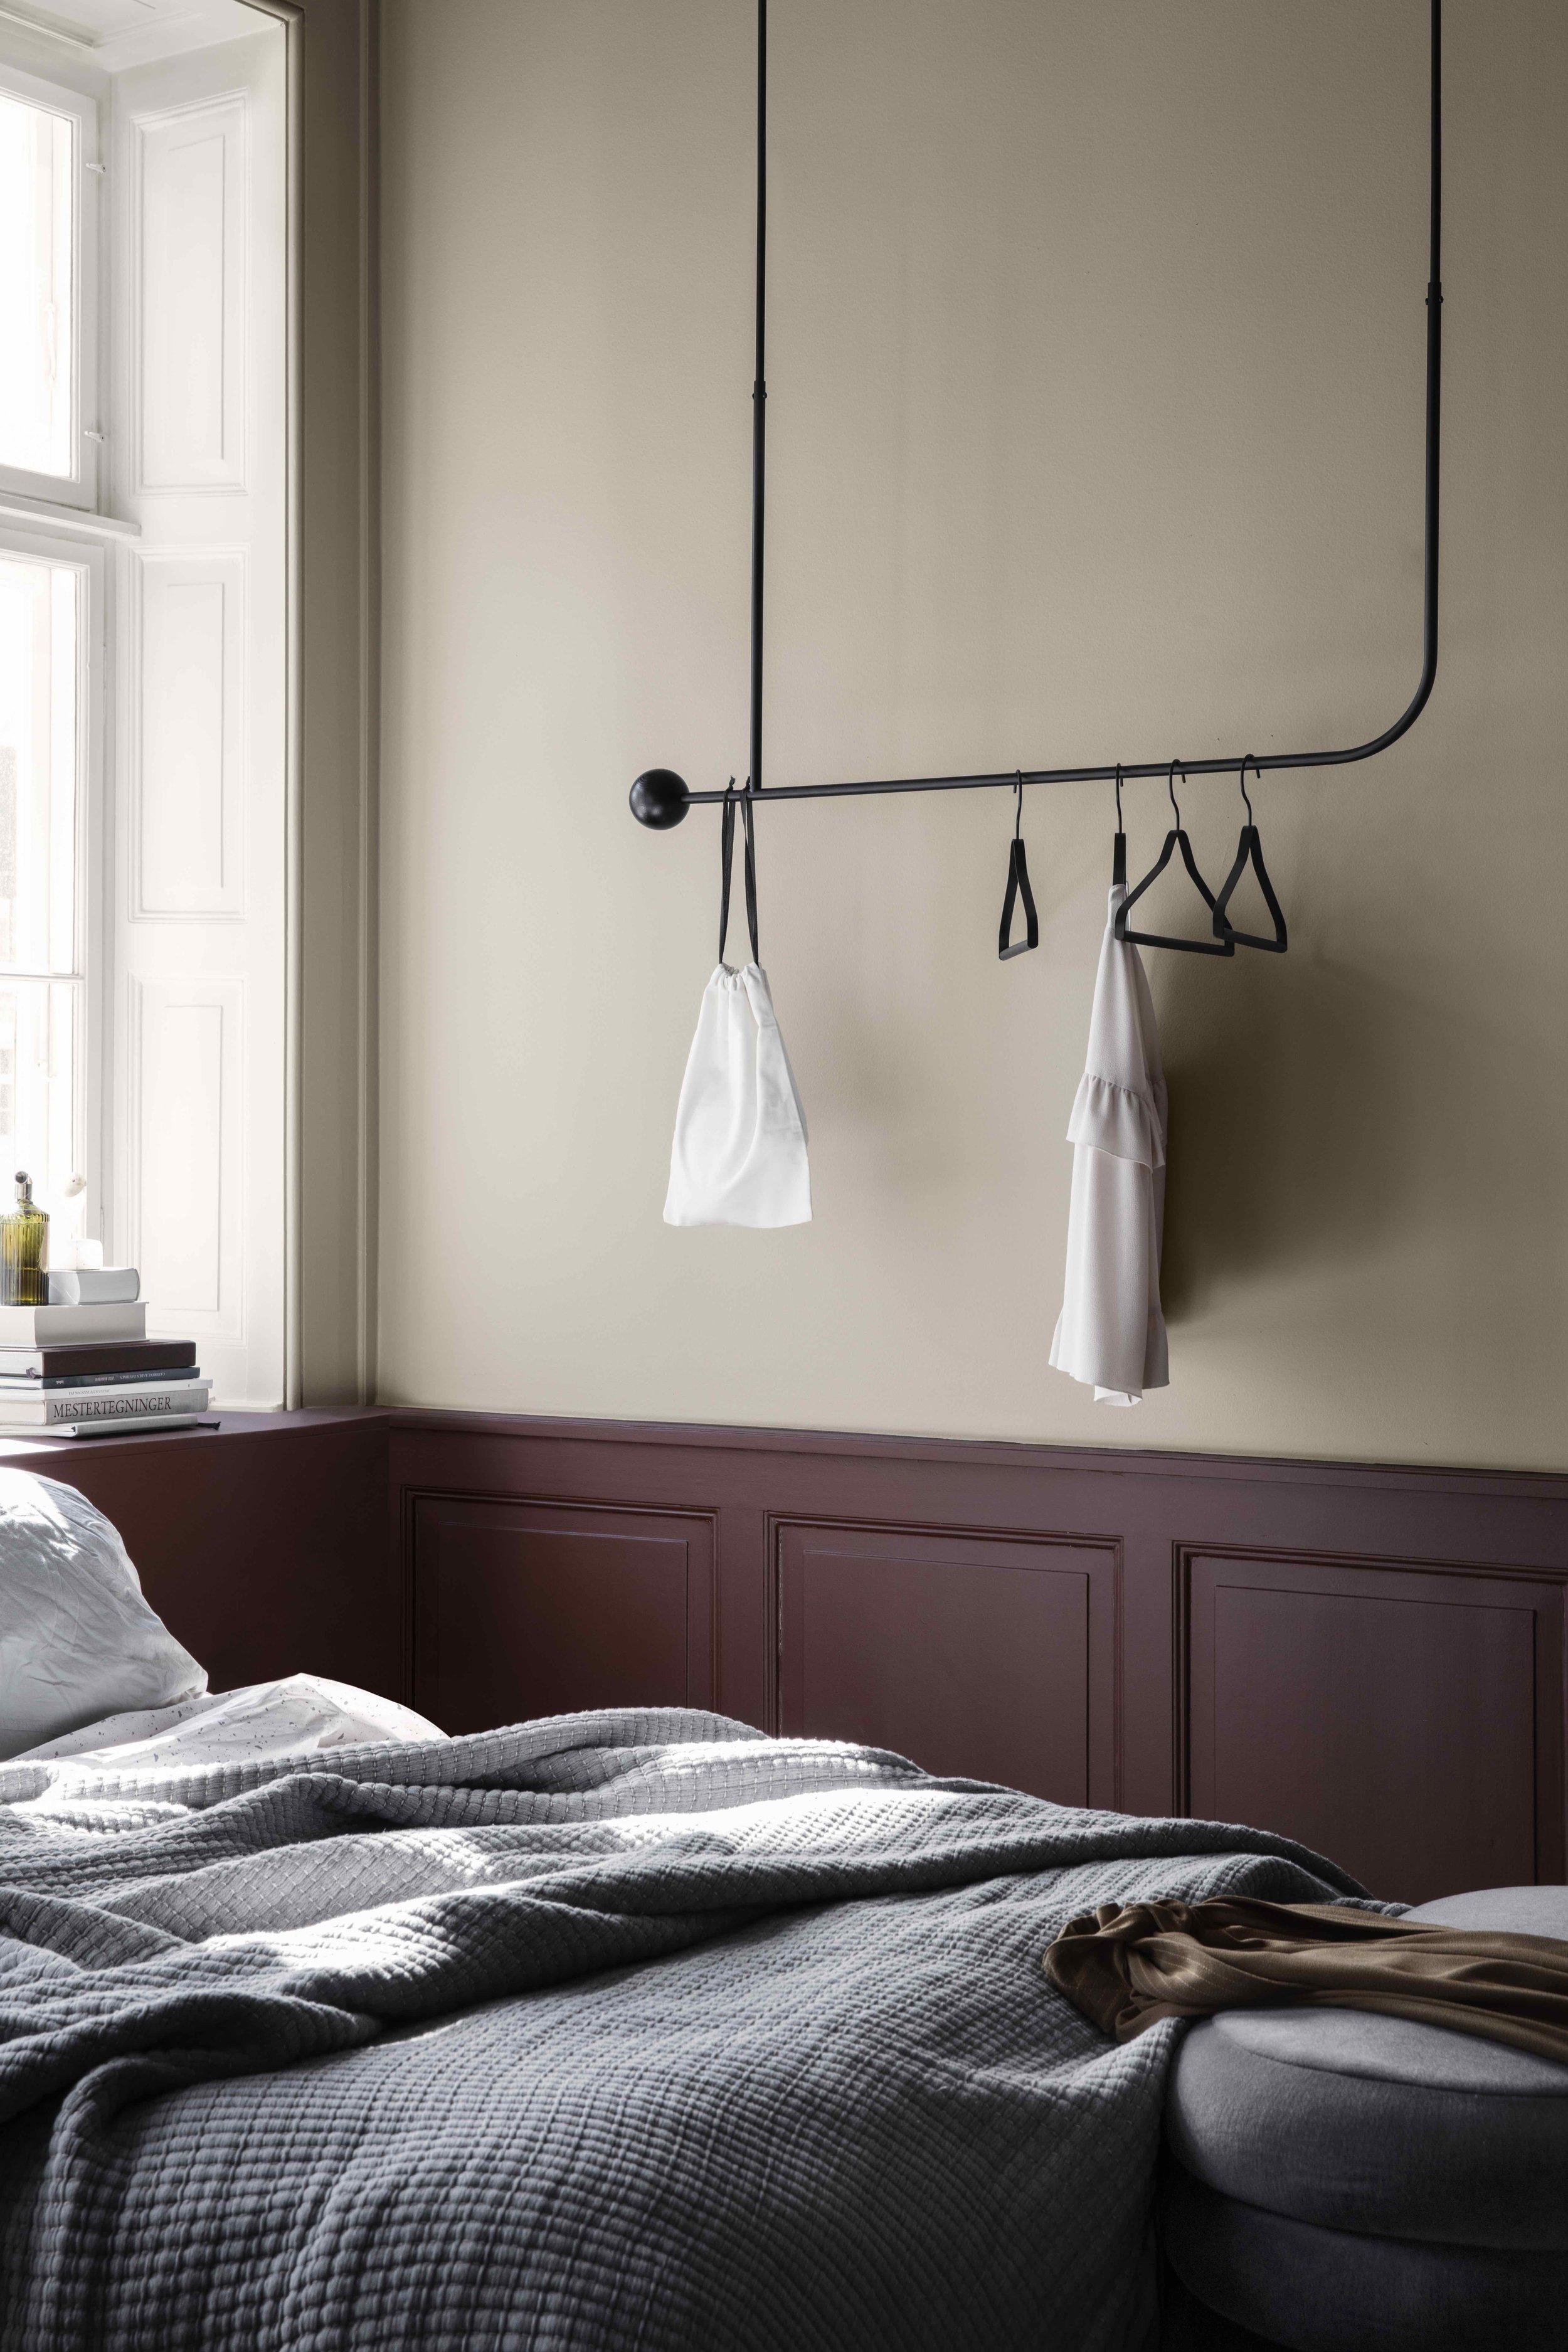 Pujo Hanging coat rack, ferm living, interiors bedroom, home decor.jpg